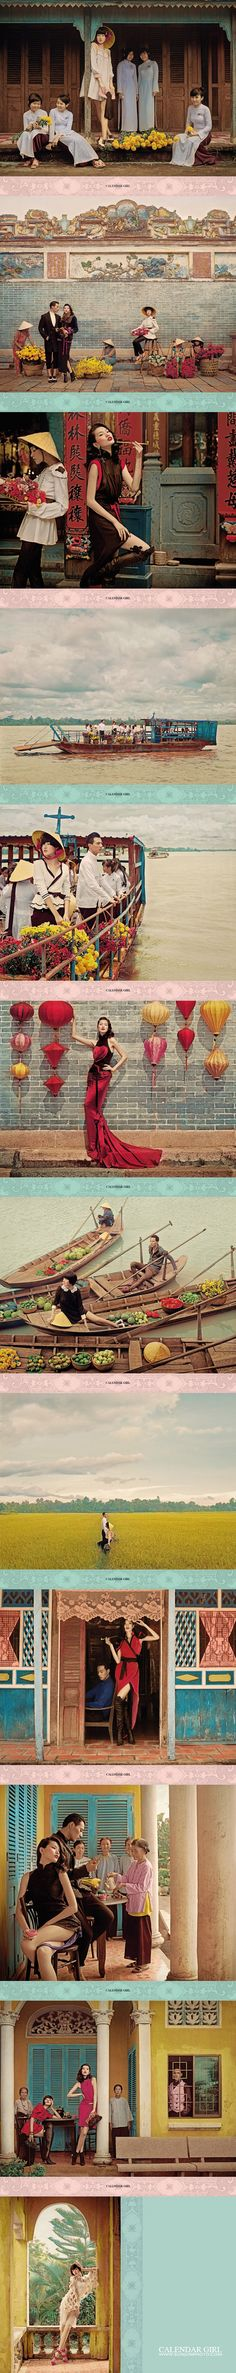 Sun Jun - Photographer-poet 孙郡|LOFTER